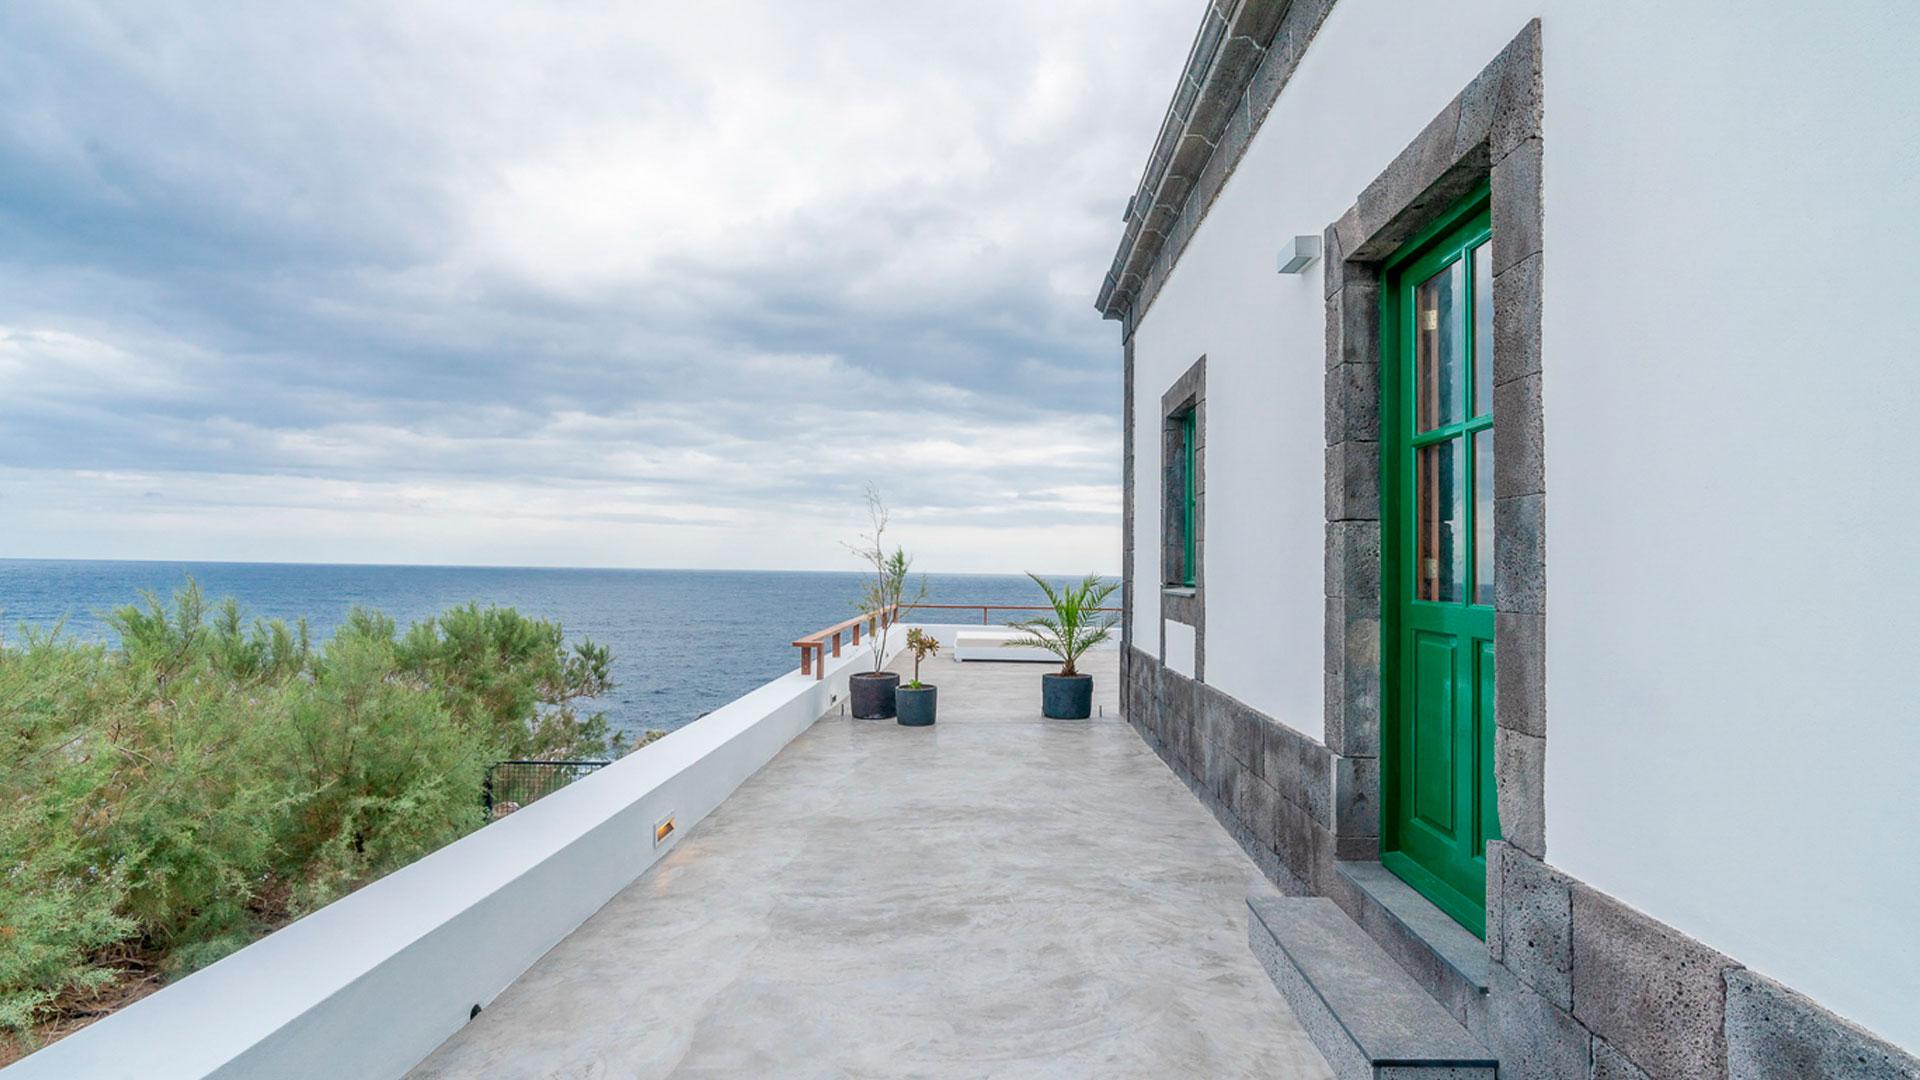 Imagen del Faro Punta cumplida